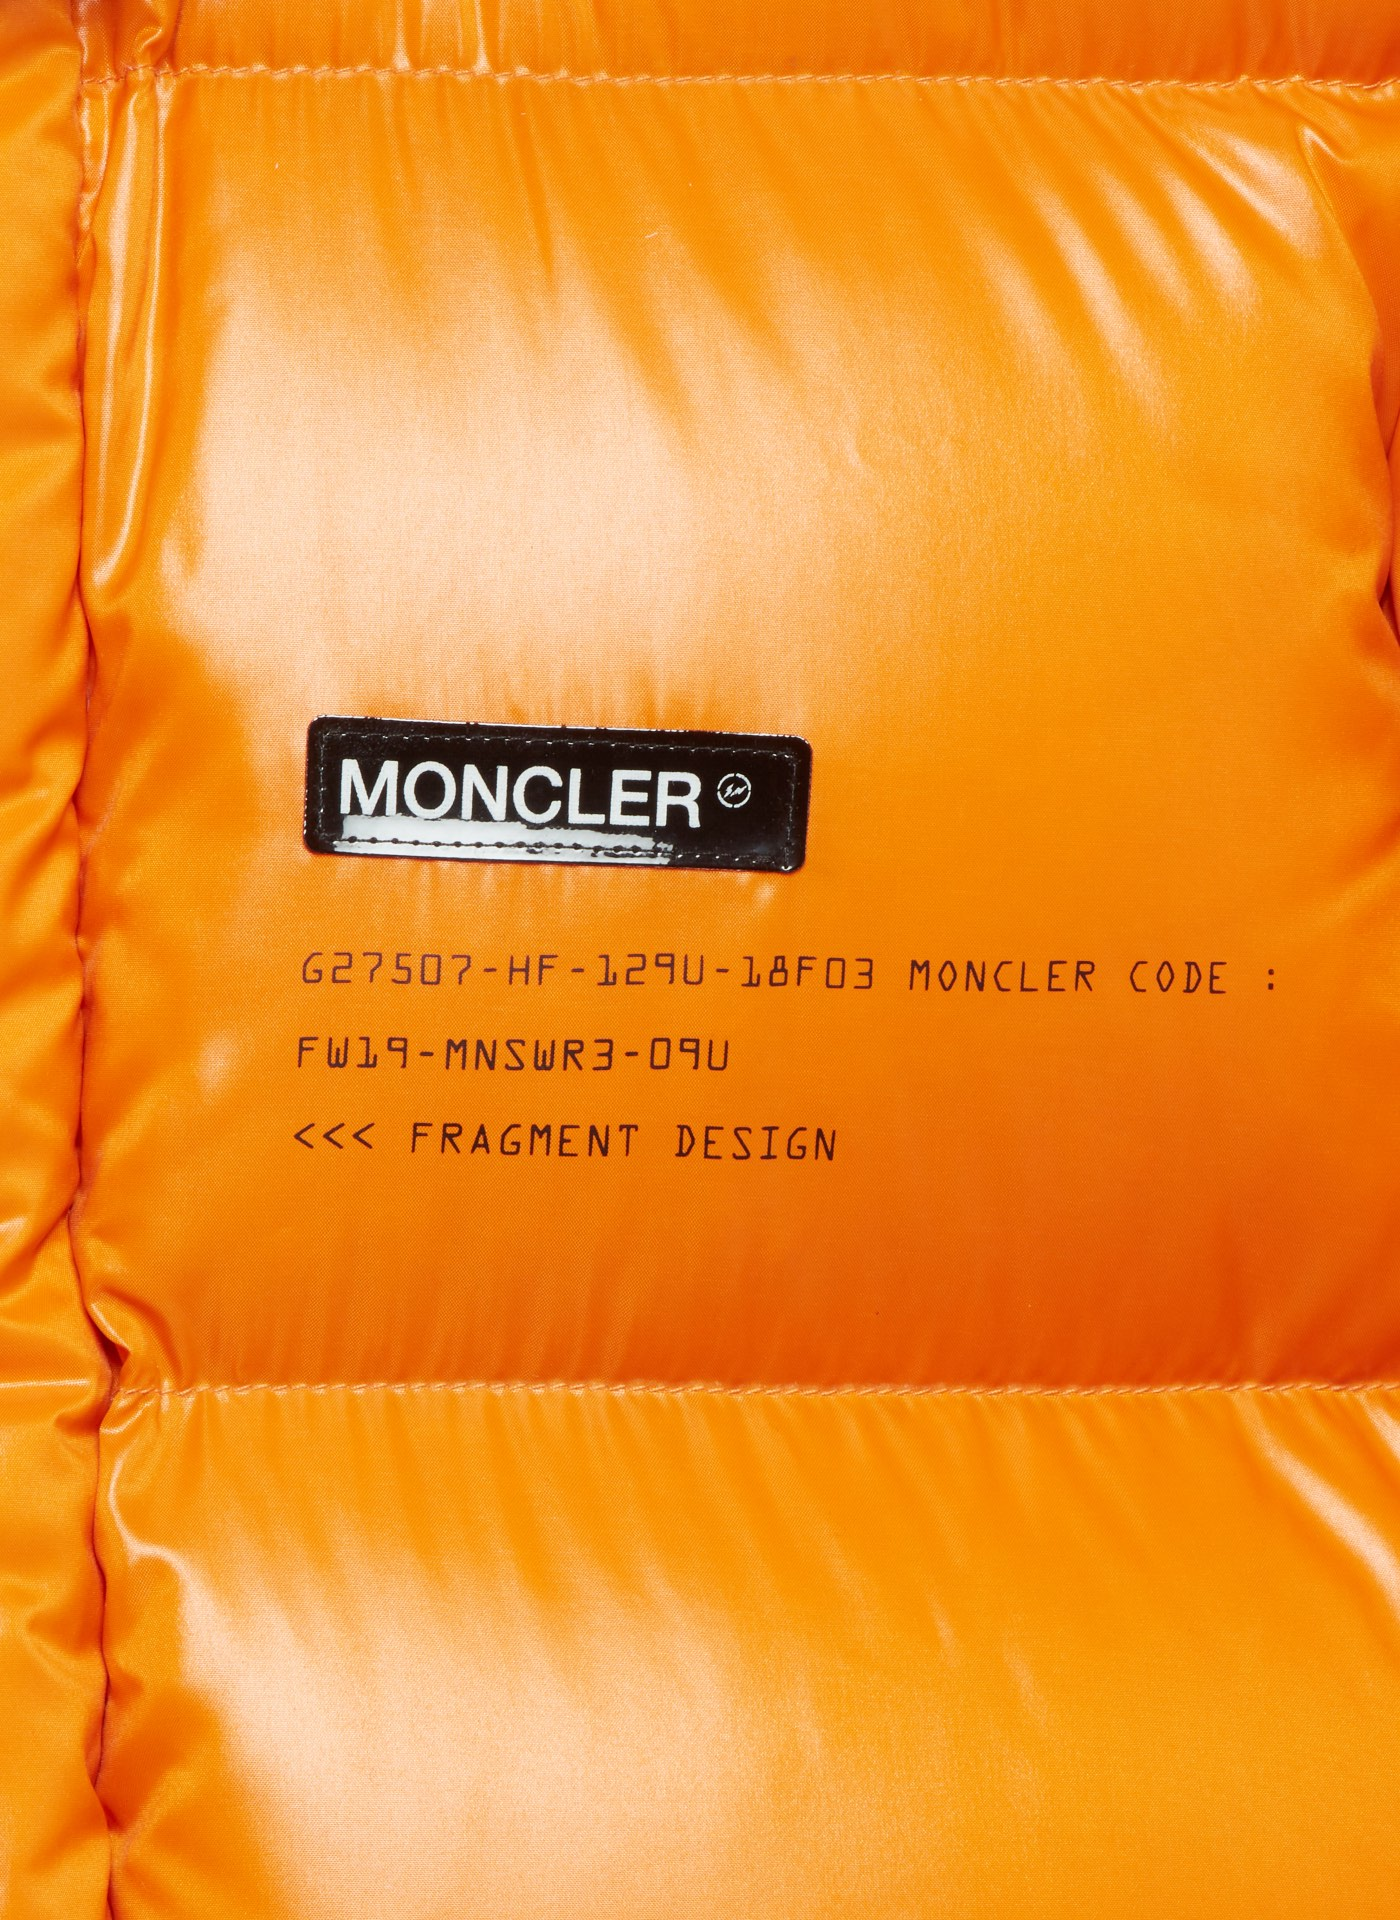 Moncler fragment close up orange jacket